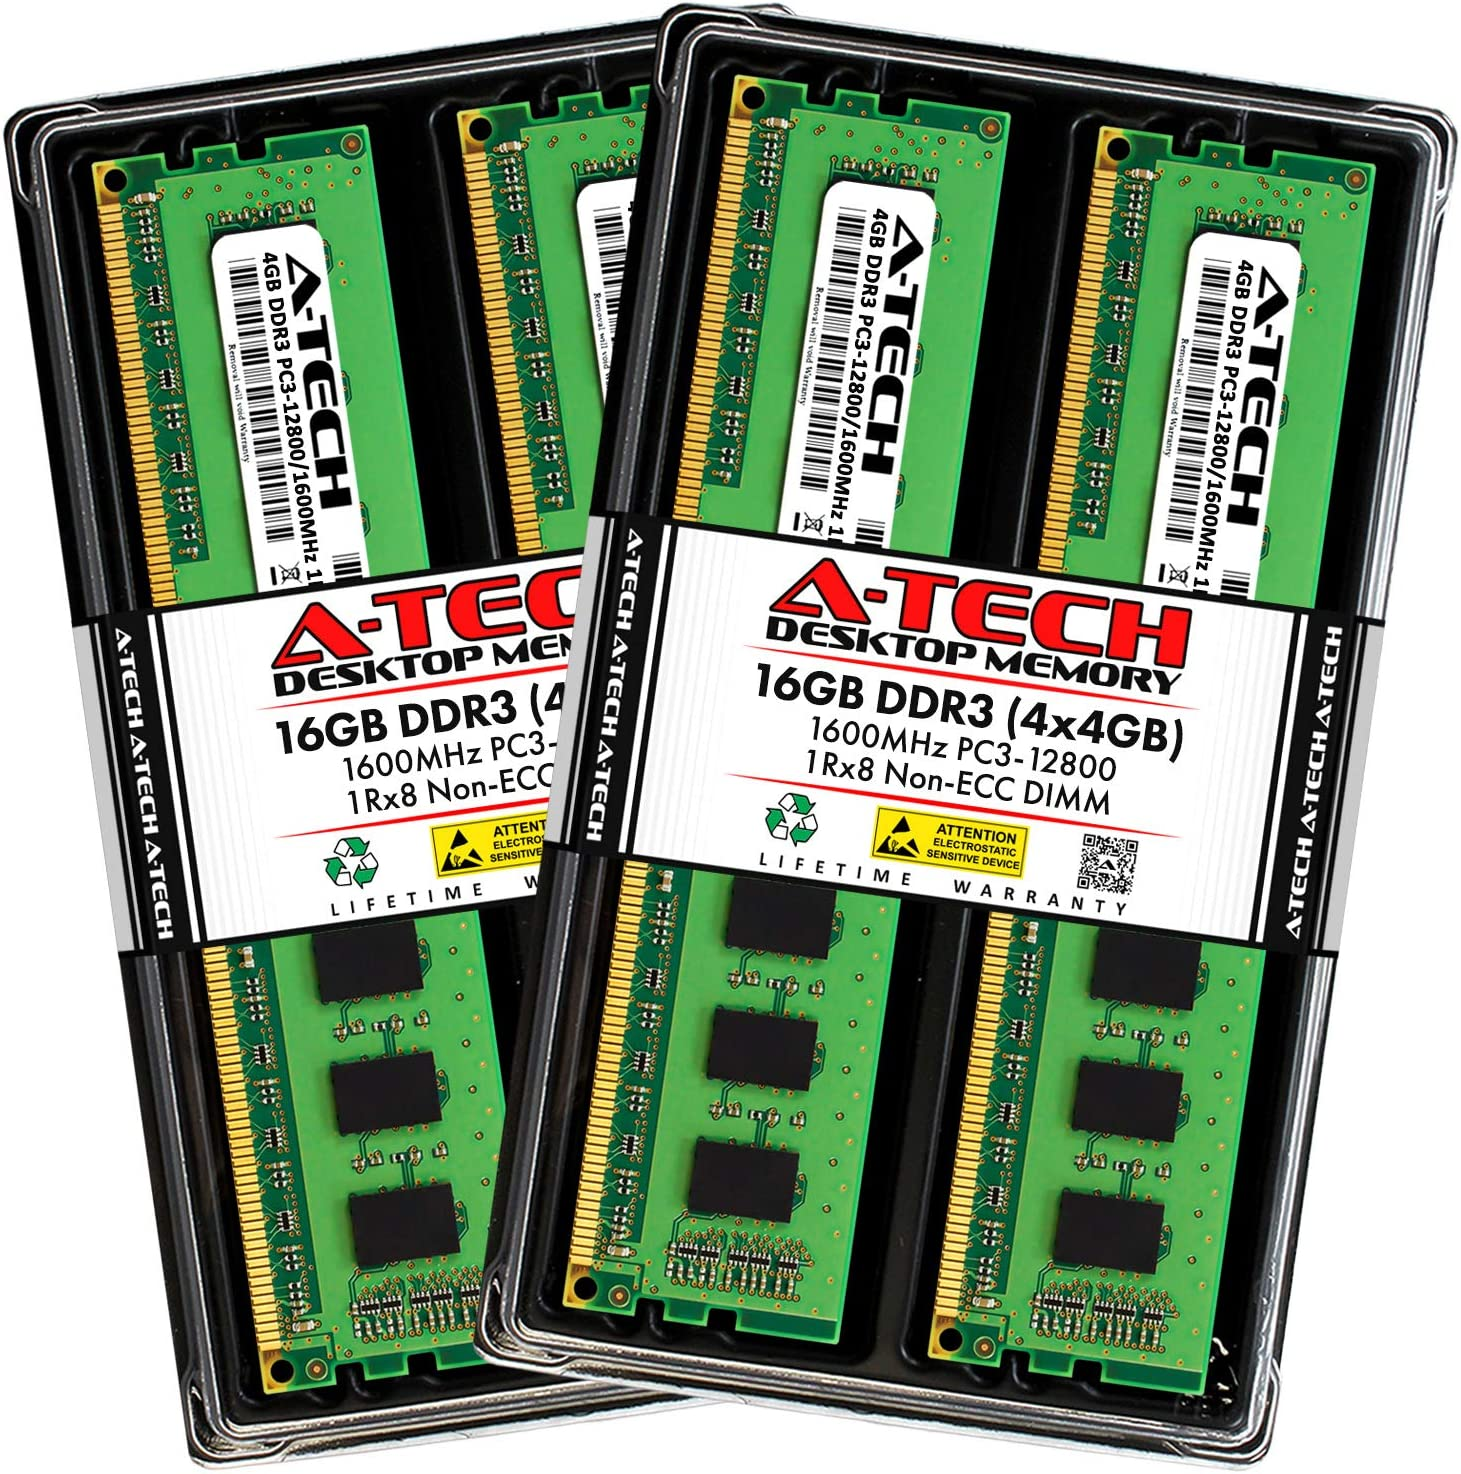 2X2GB SAMSUNG 4GB PC3-12800 DDR3-1600 240 PIN 1Rx8 Low Density Desktop Memory